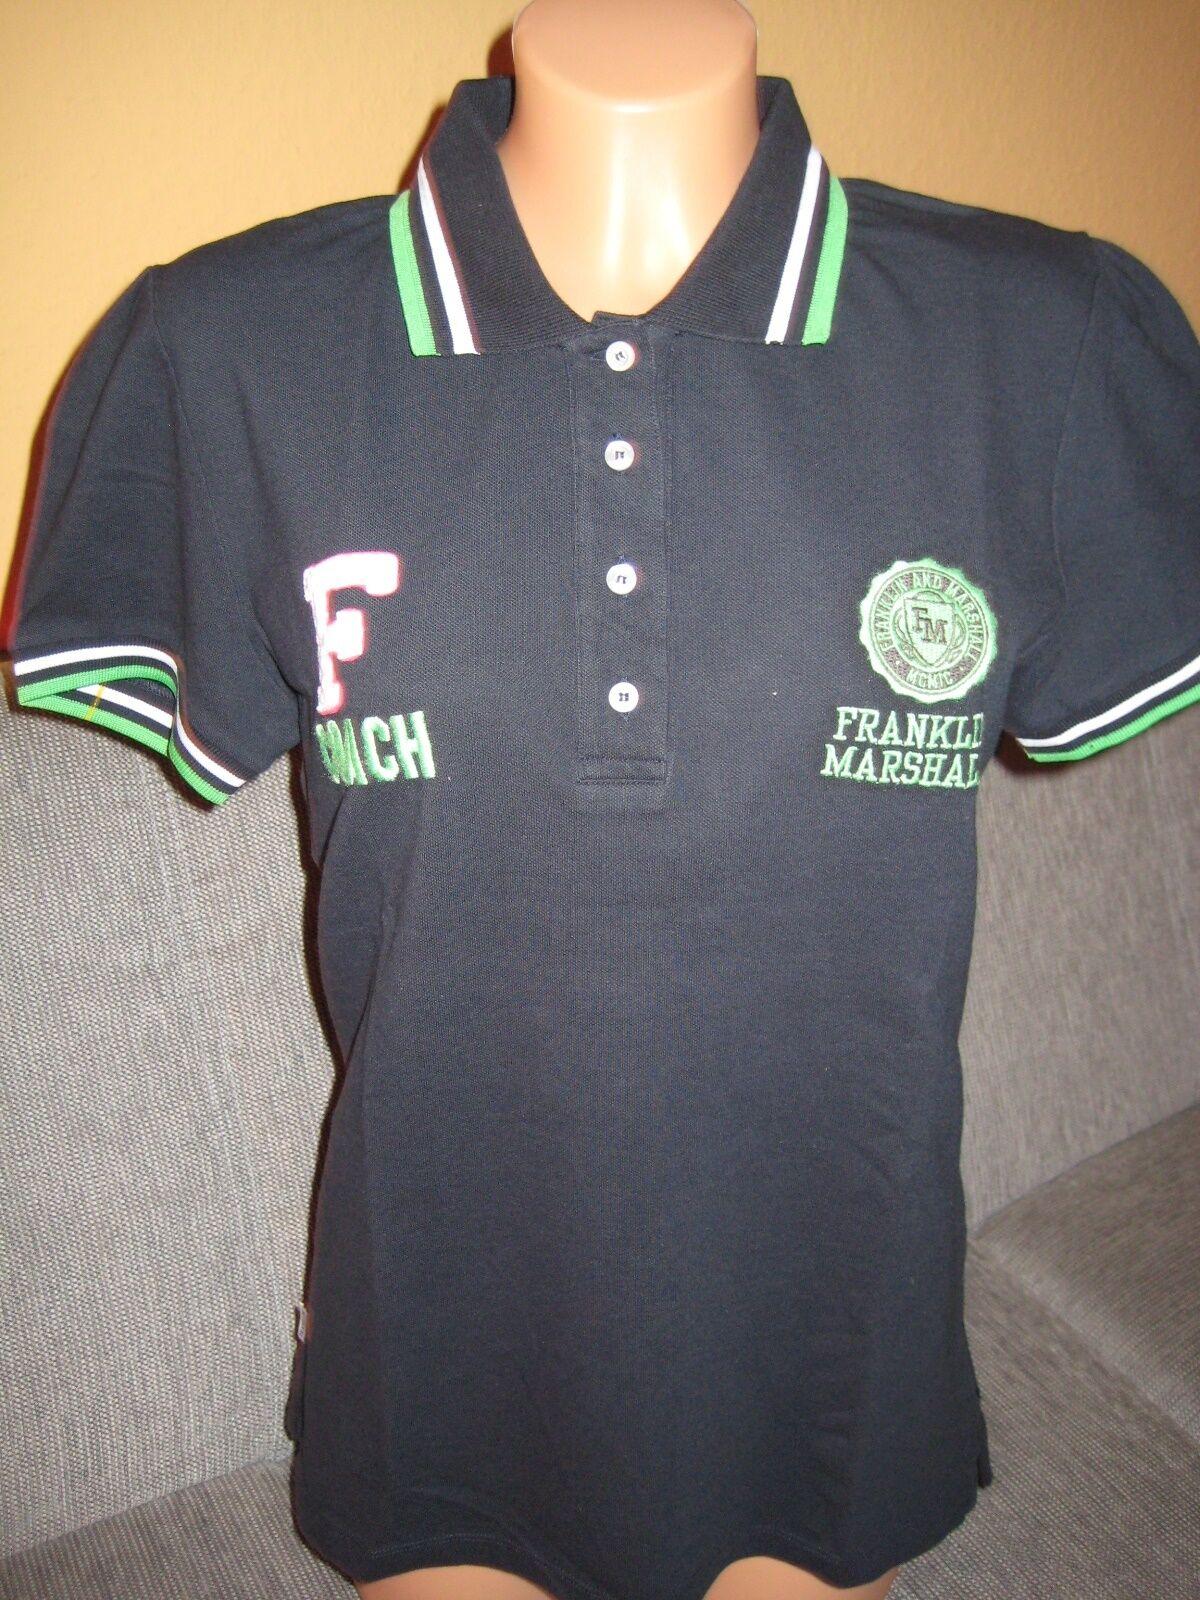 FRANKLIN MARSHALL Polo Shirt DAMEN Gr. XL NEU mit Etikett    NP